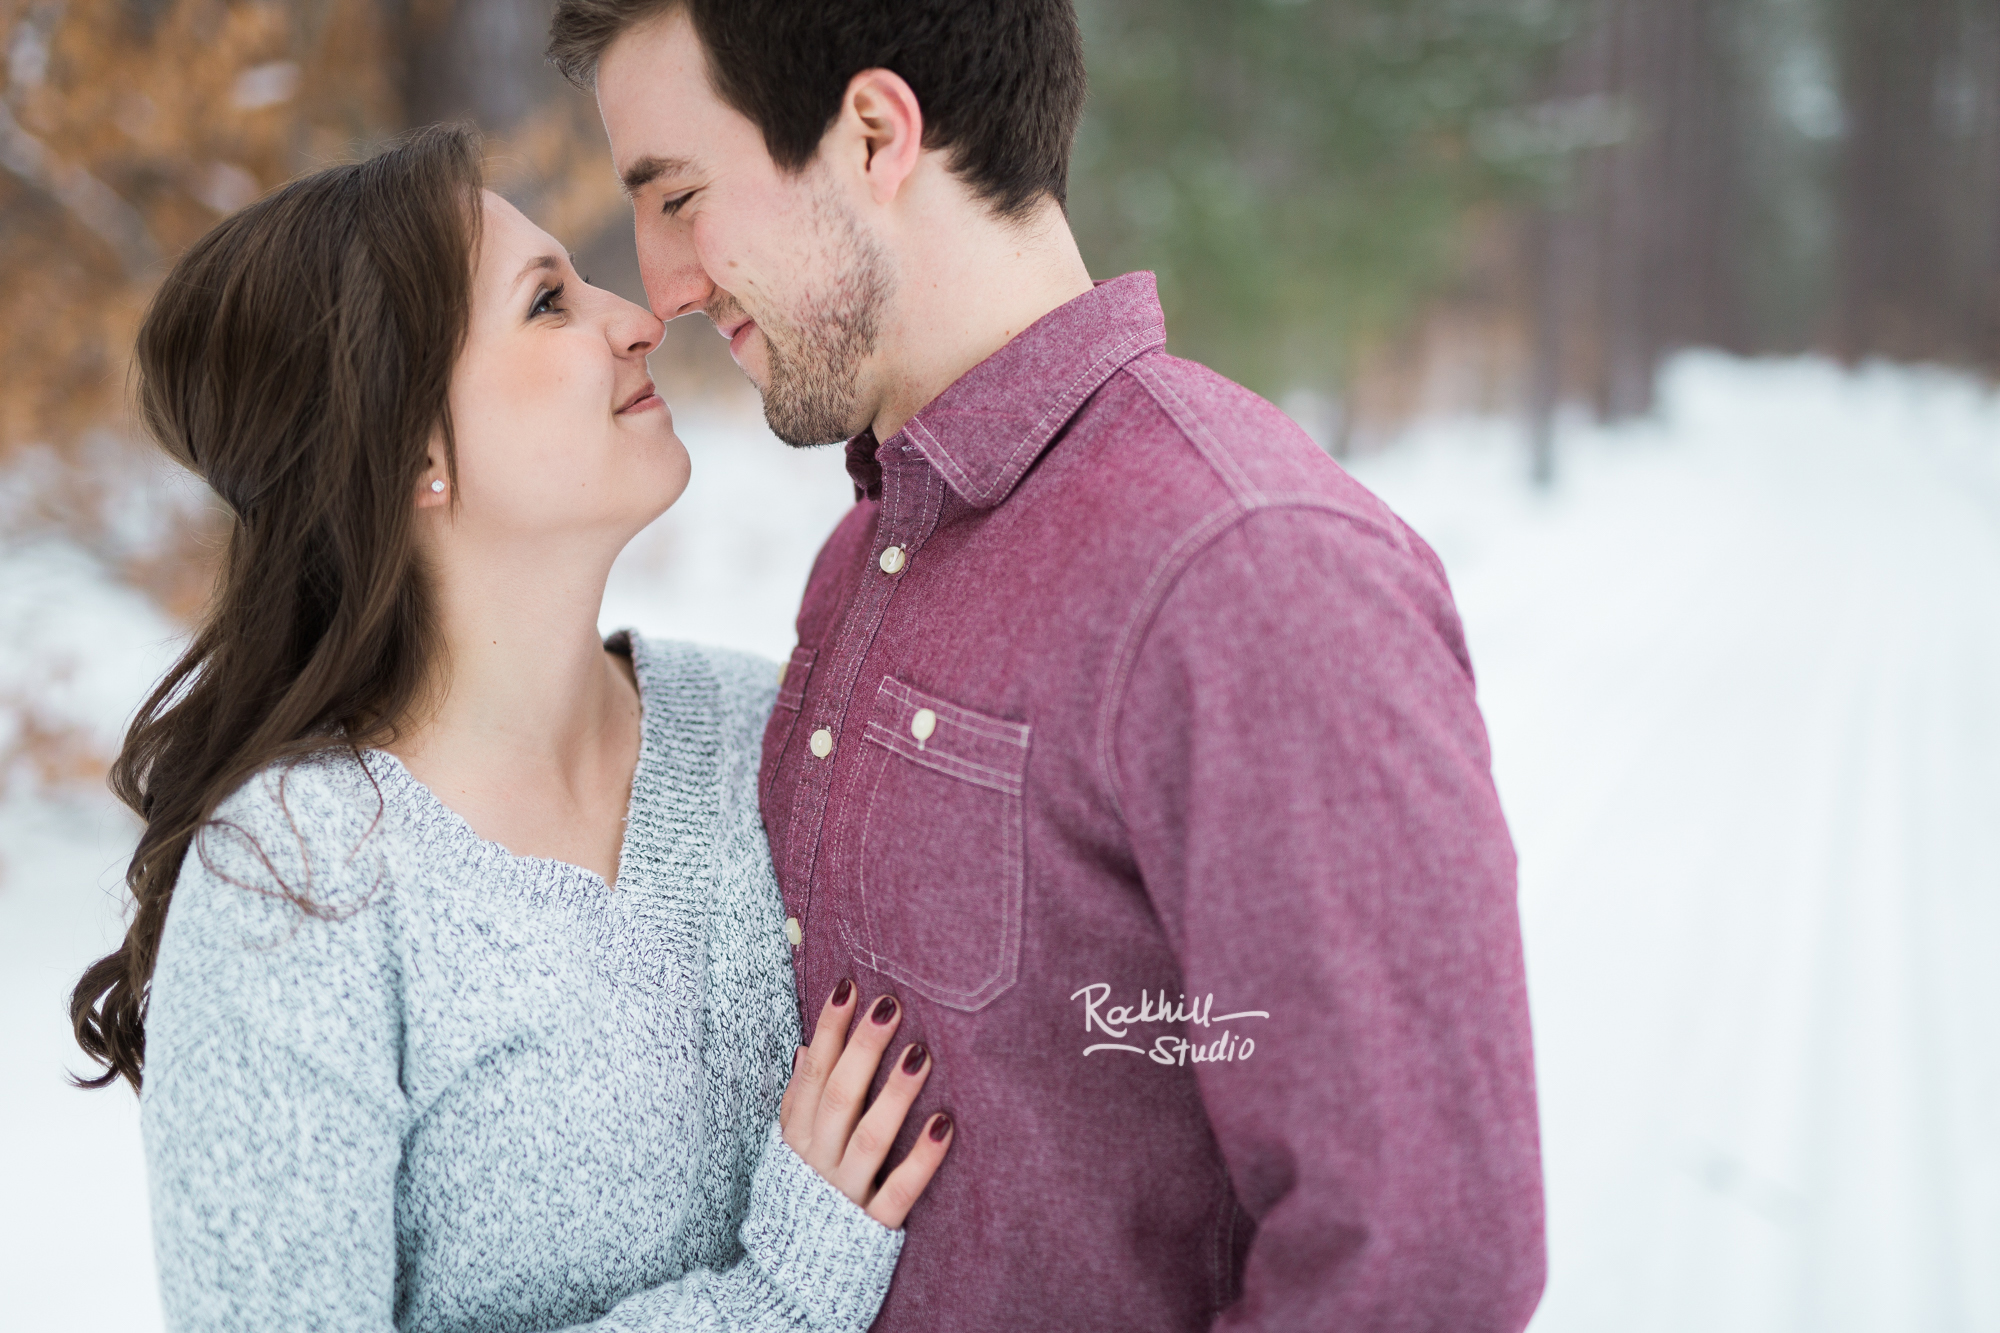 rockhill-studio-northern-michigan-engagement-photography-upper-peninsula-marquette-wedding-winter-23.jpg